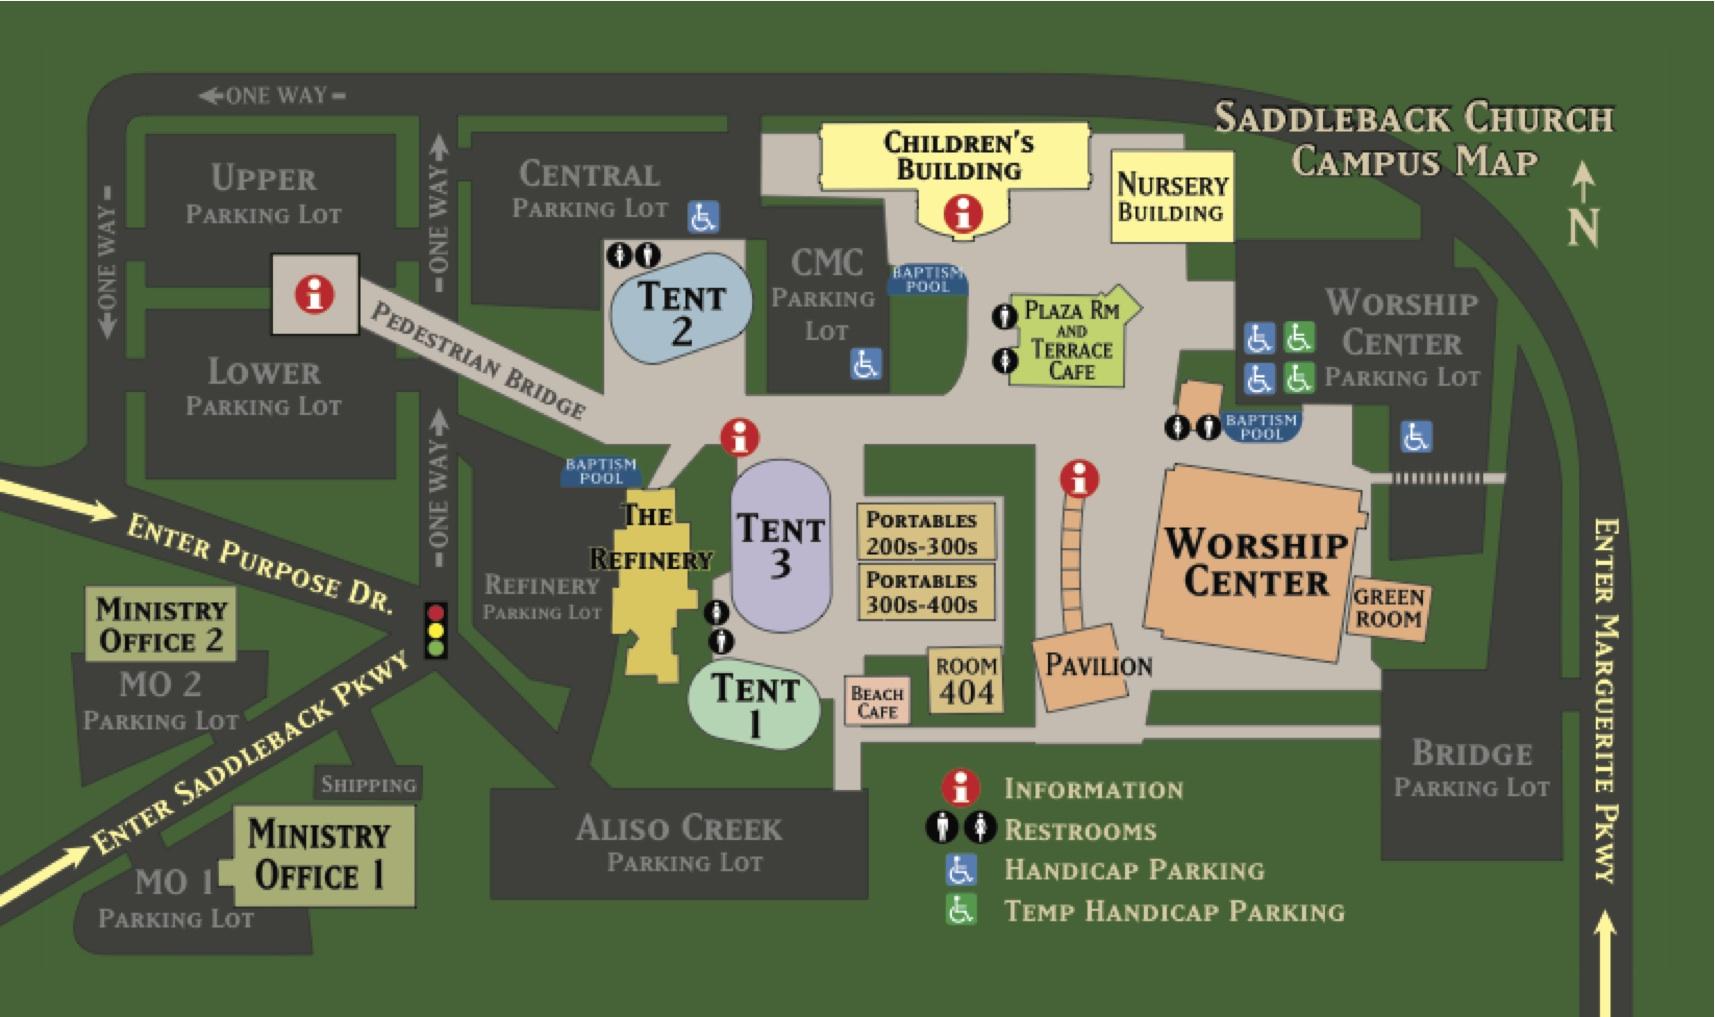 saddleback church campus map Rick Warren Churchleadership Wiki saddleback church campus map